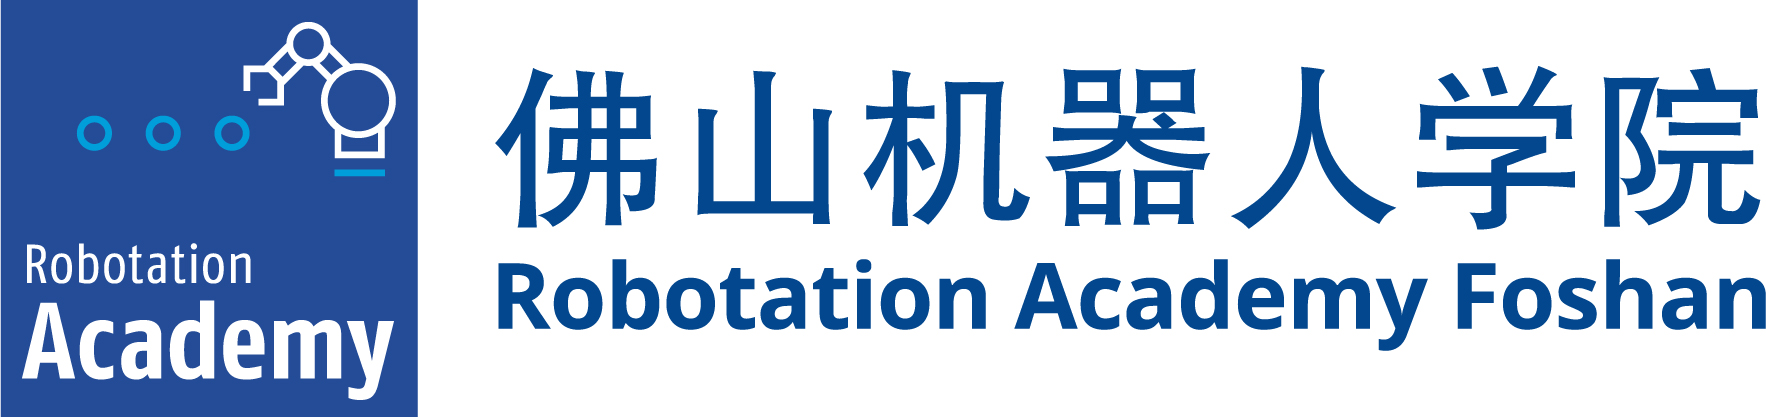 Robotation academy Foshan